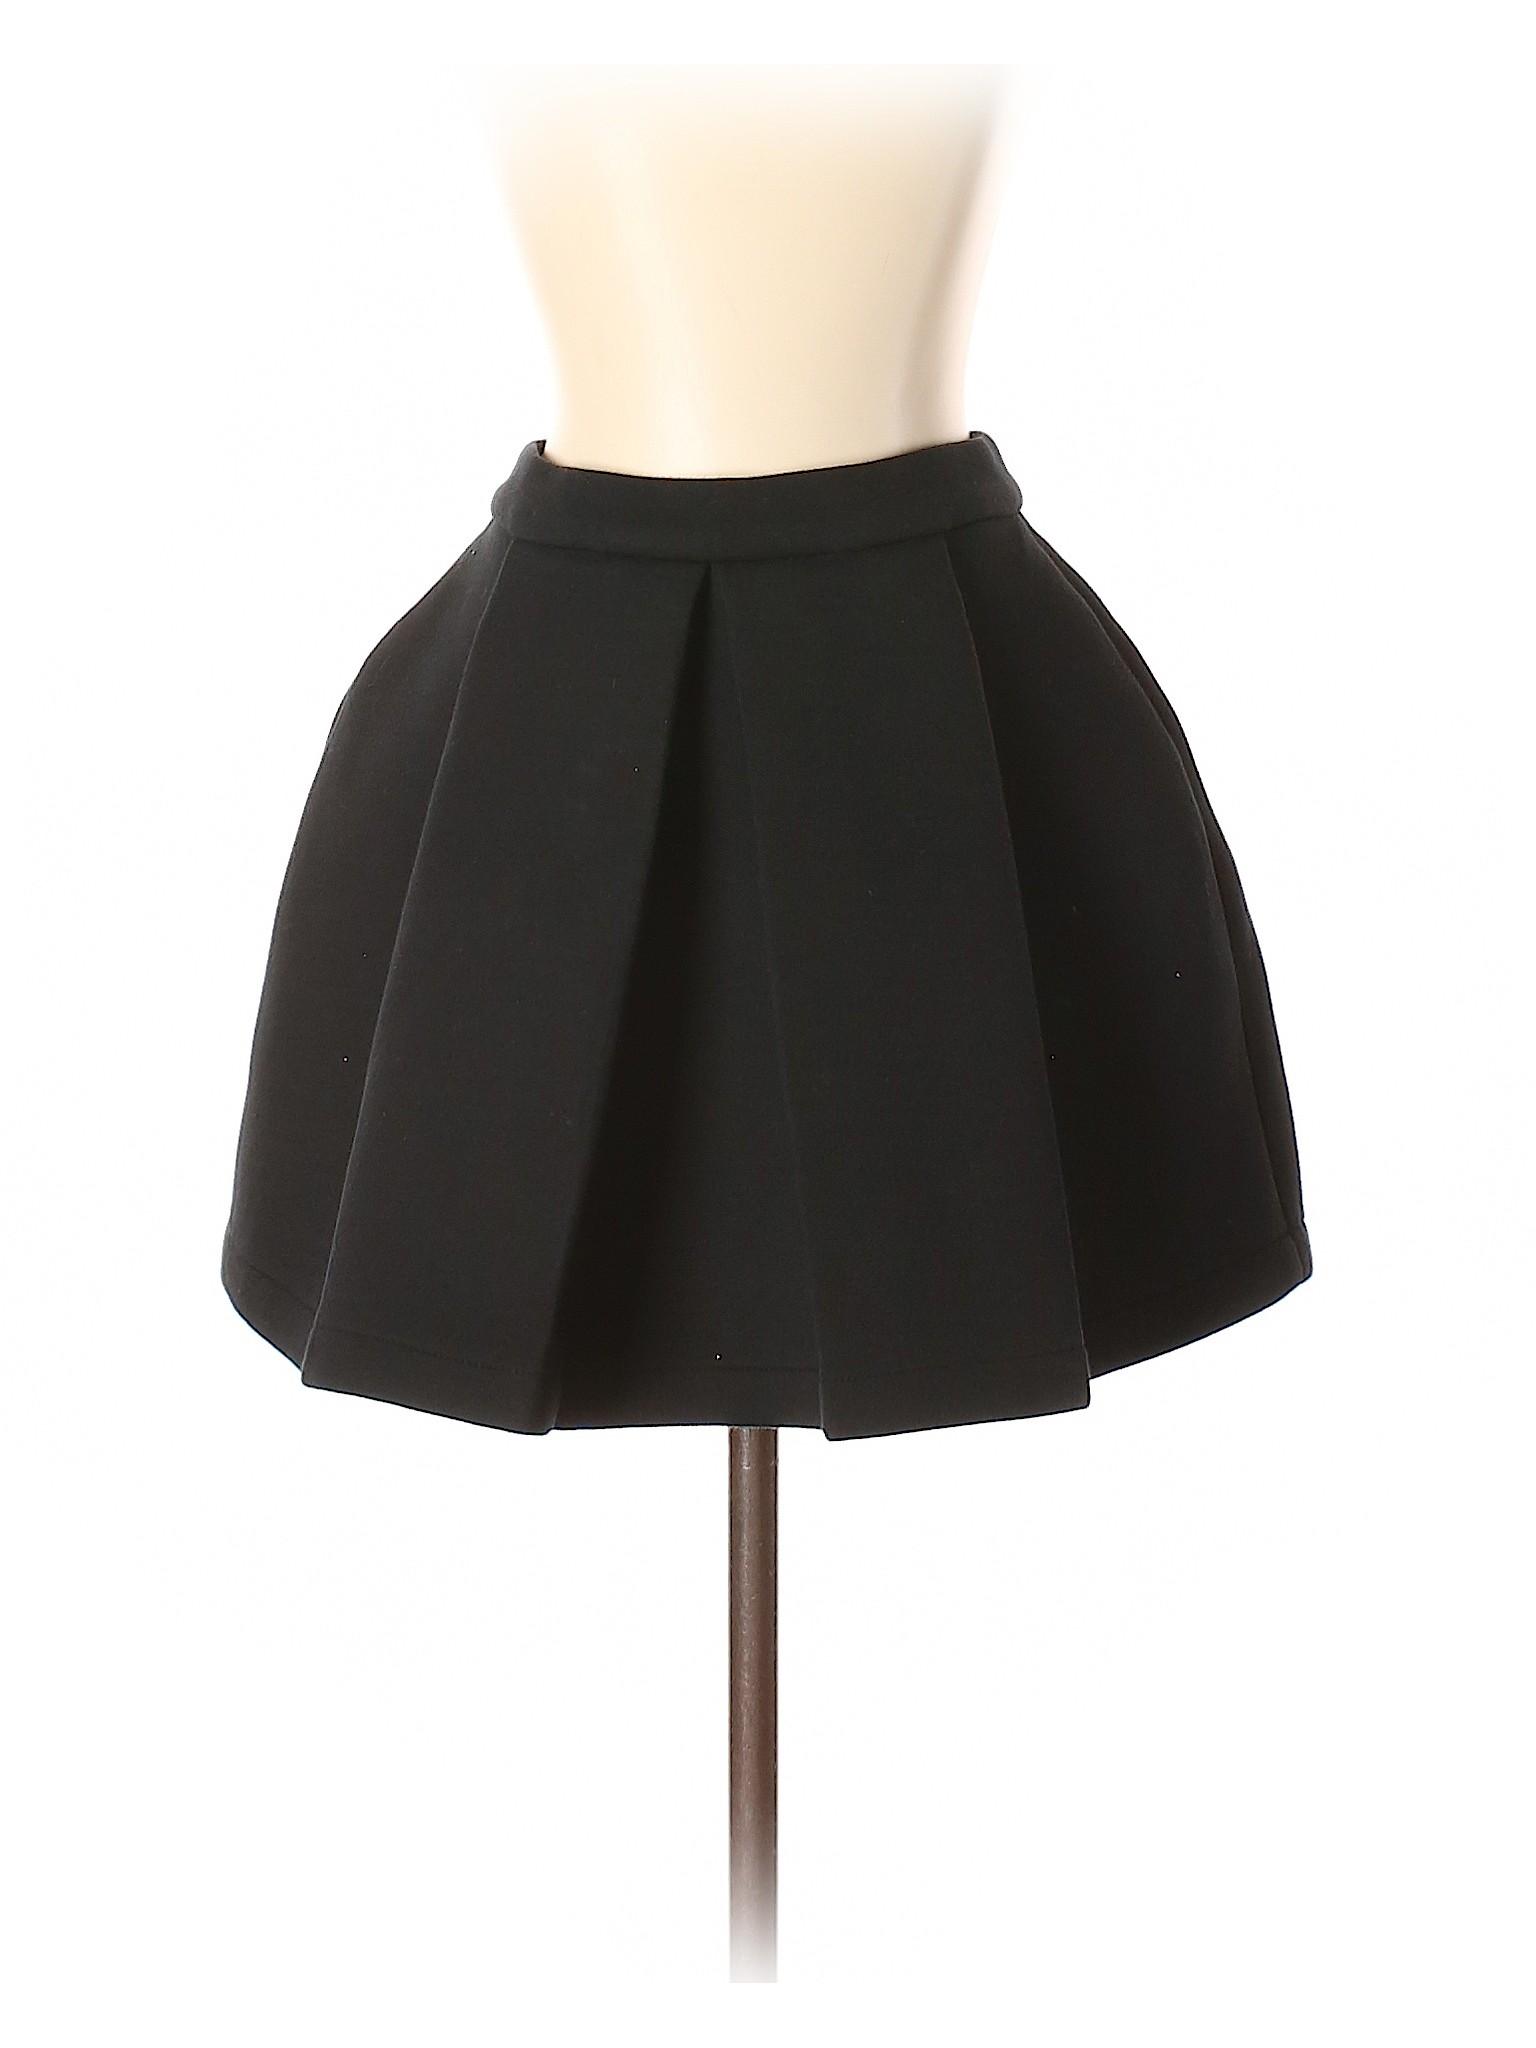 Boutique Boutique Skirt Casual Boutique Boutique Skirt Casual Casual Skirt Casual pnFx7n6